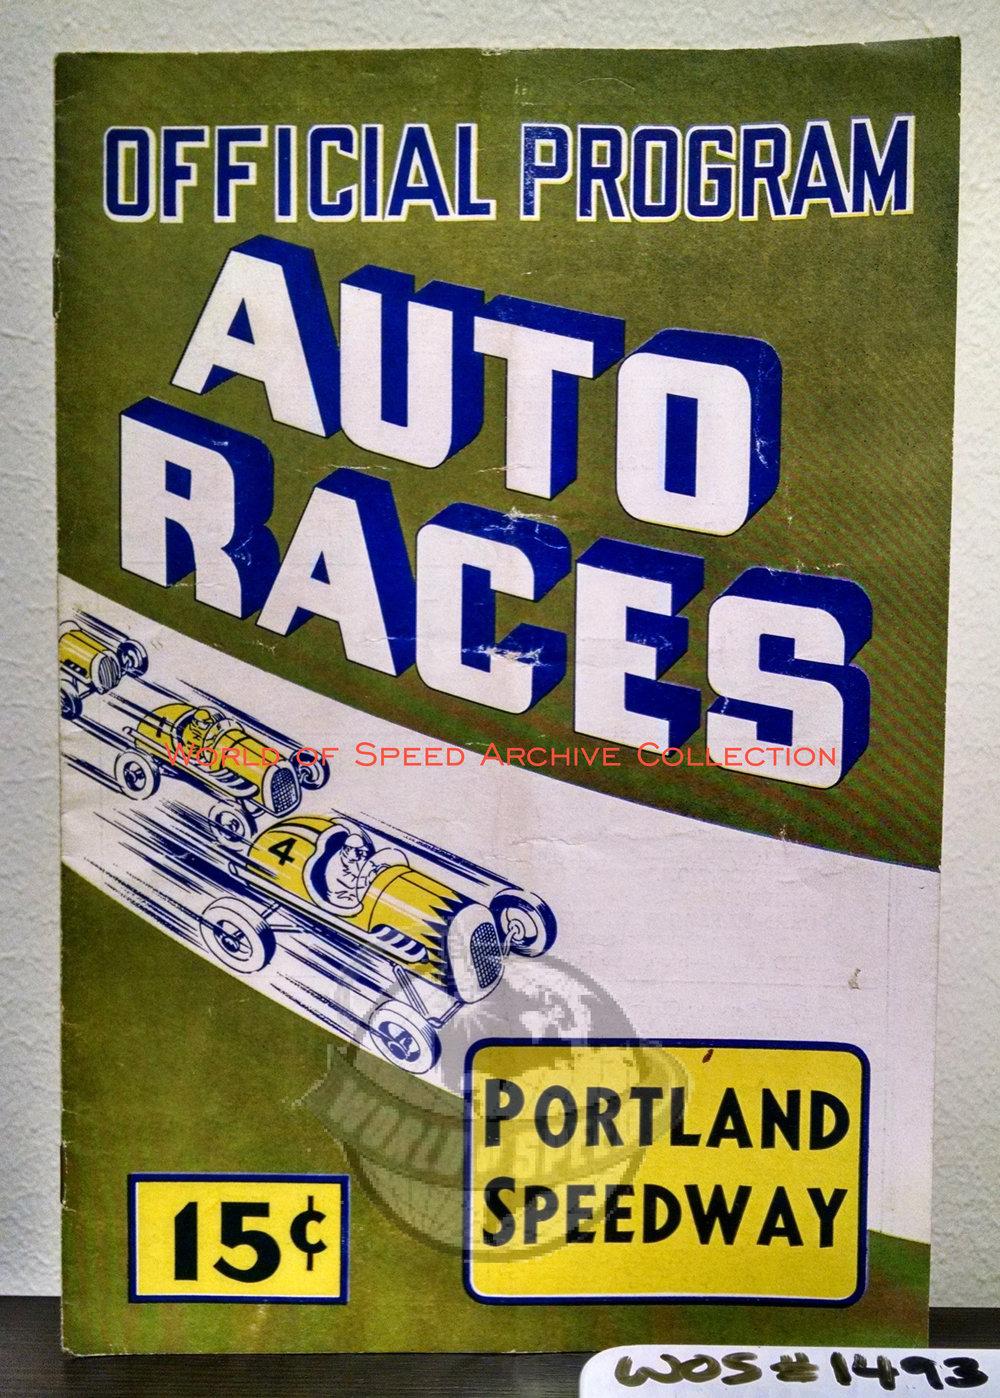 1949 Portland Speedway program